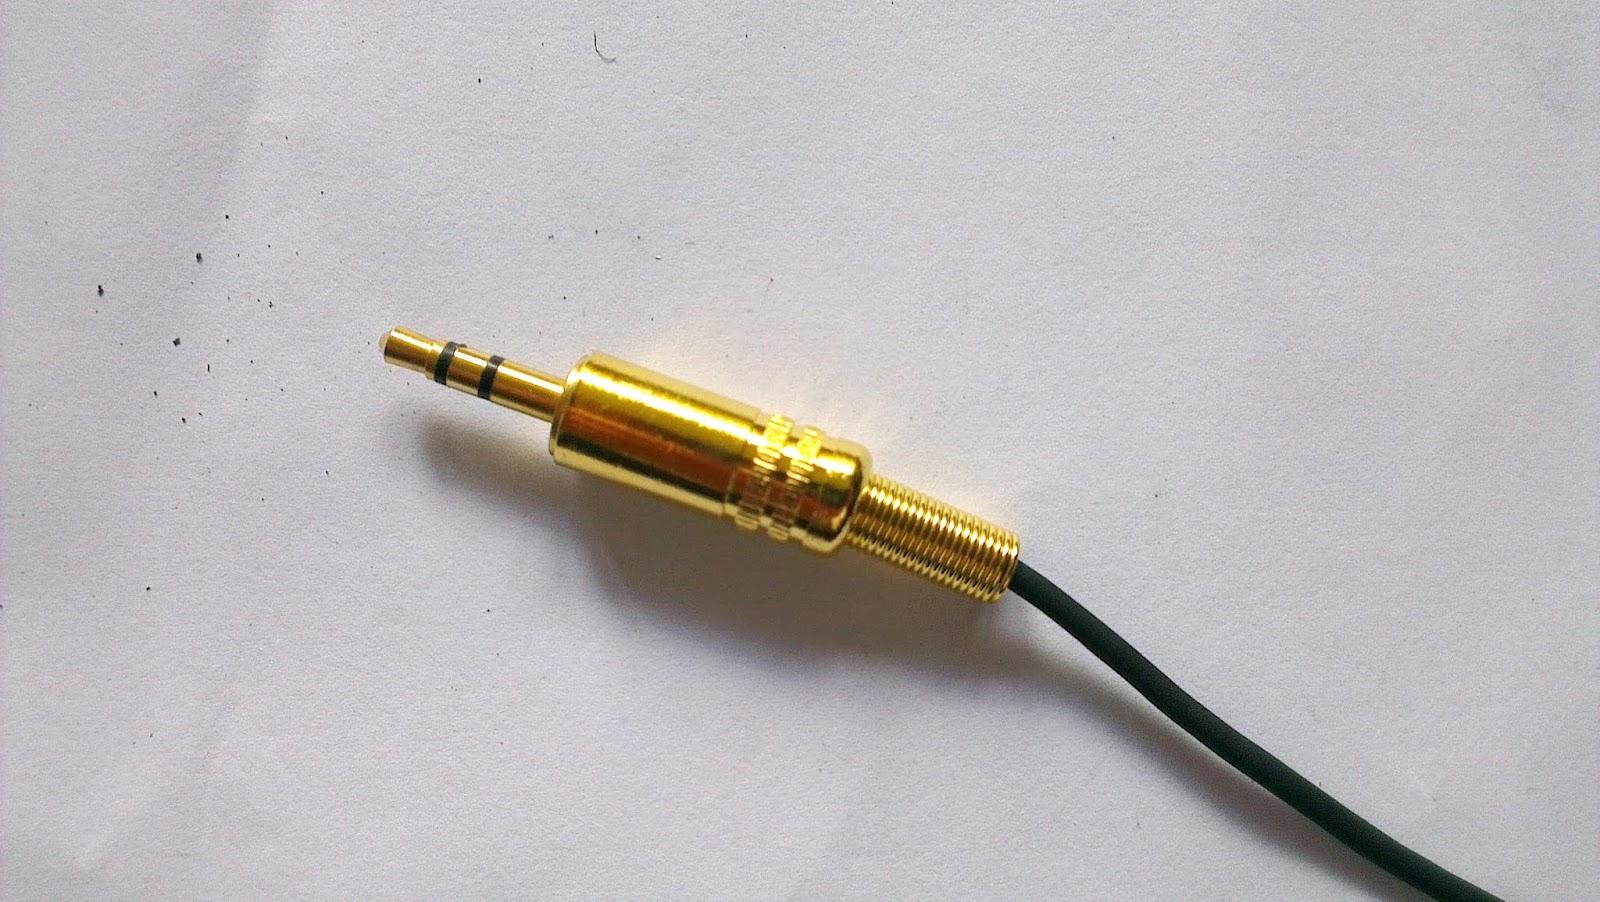 Sennheiser 3.5mm Connector Repair   Hacks, facts and rants